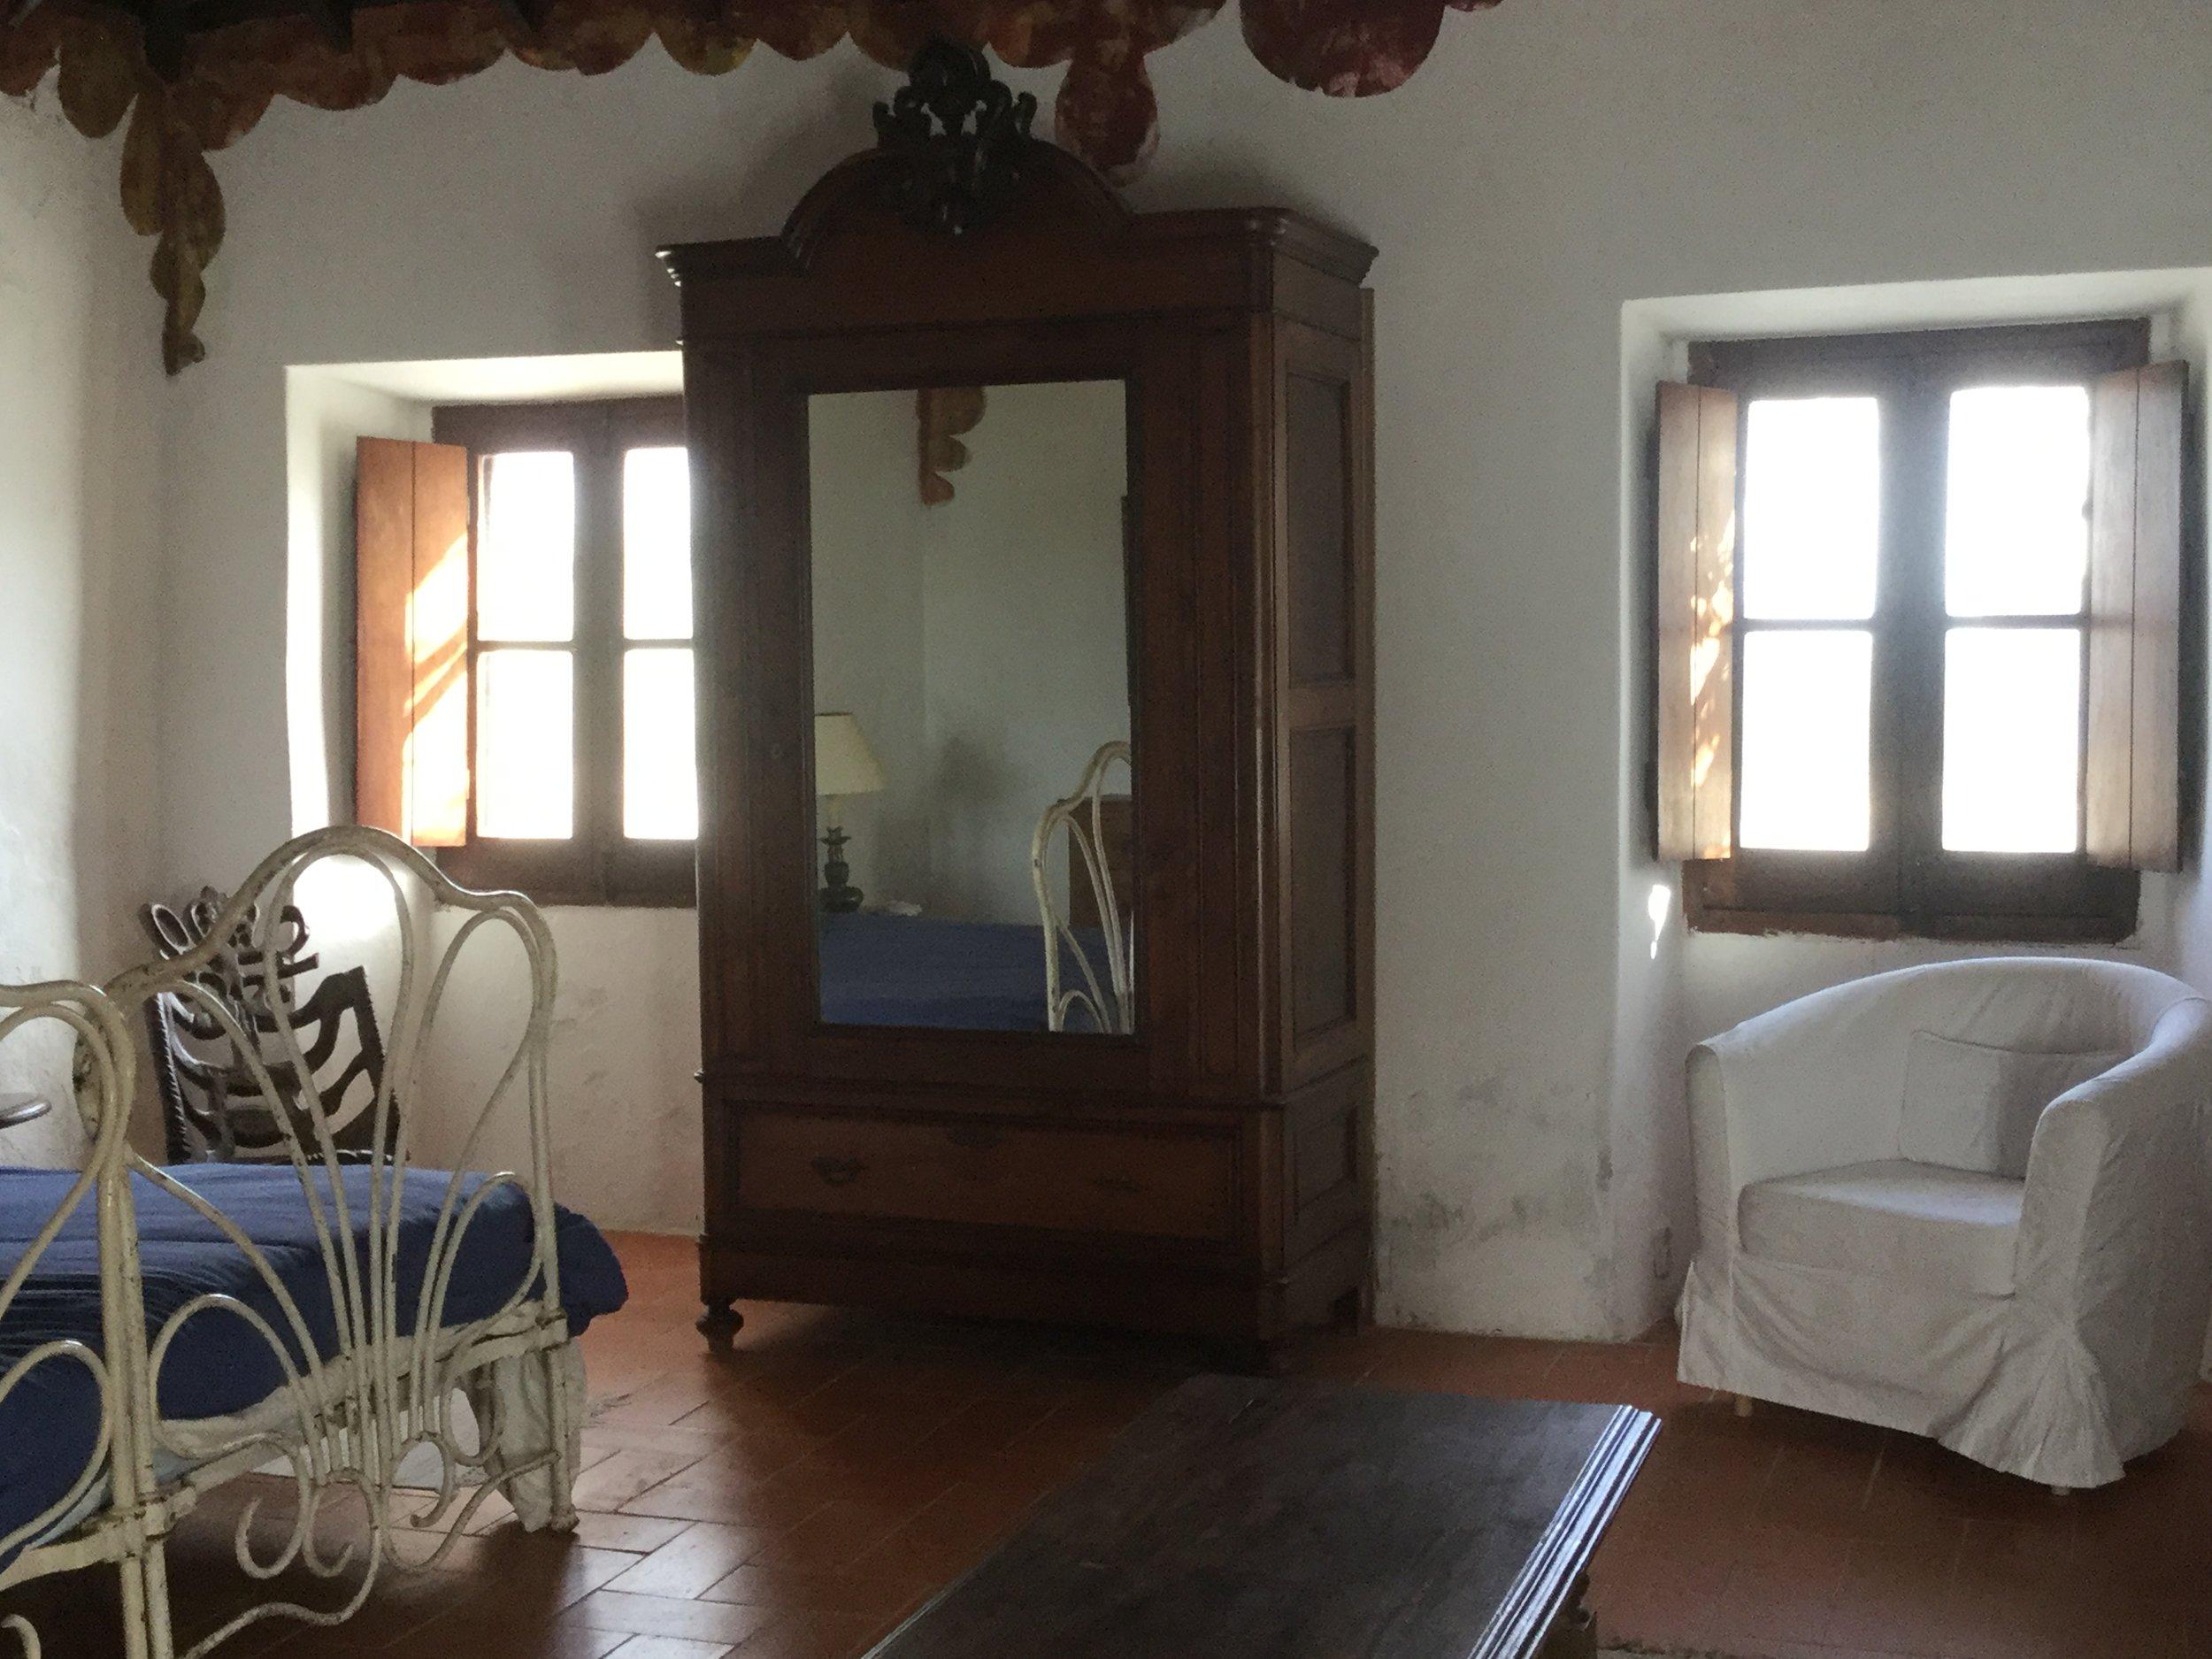 The master bedroom with door to the terrace